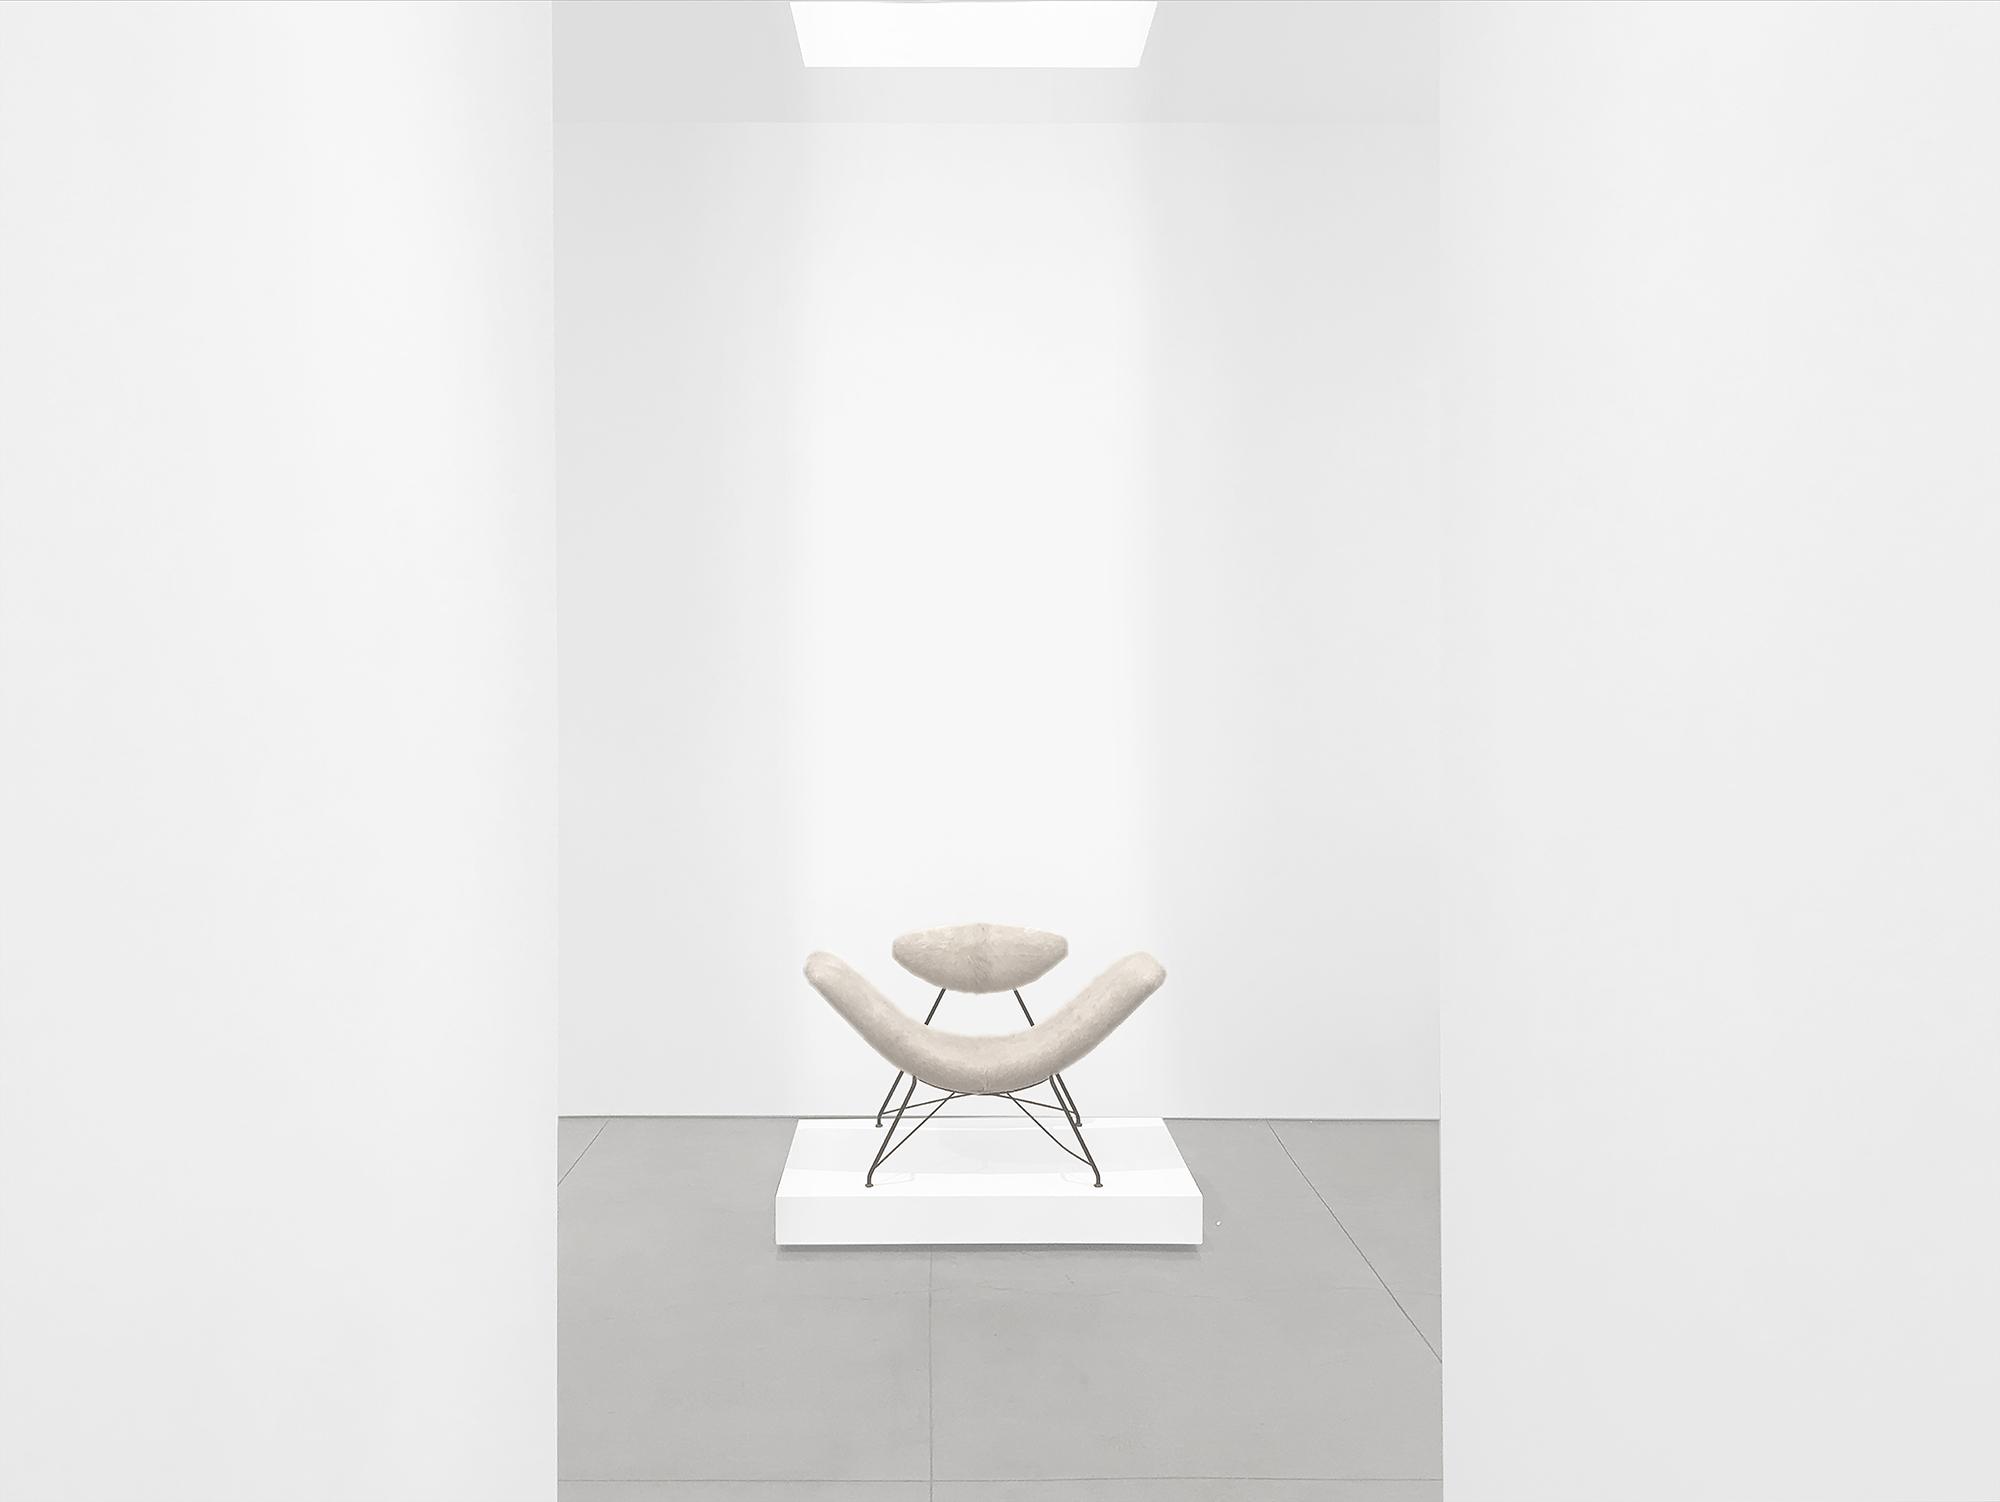 Design Brasileiro, Curated by Ulysses de Santi, Peter Blake Gallery, 2018, Installation View_13_resize.jpg